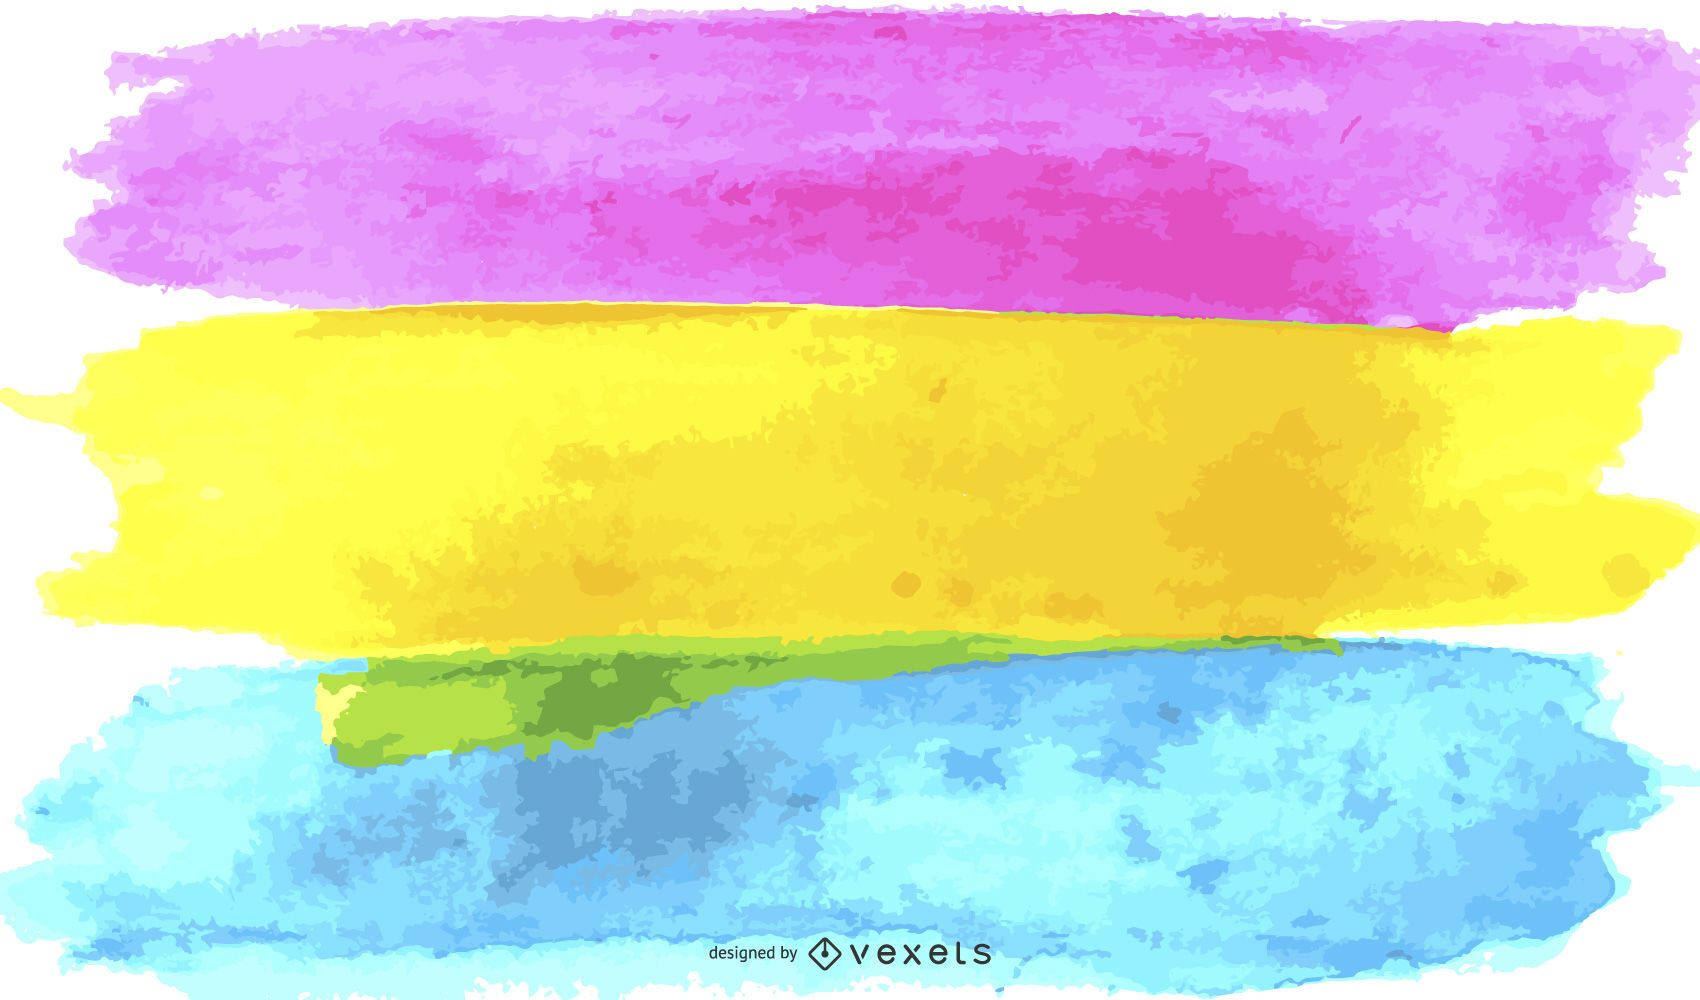 Pansexual pride flag watercolor